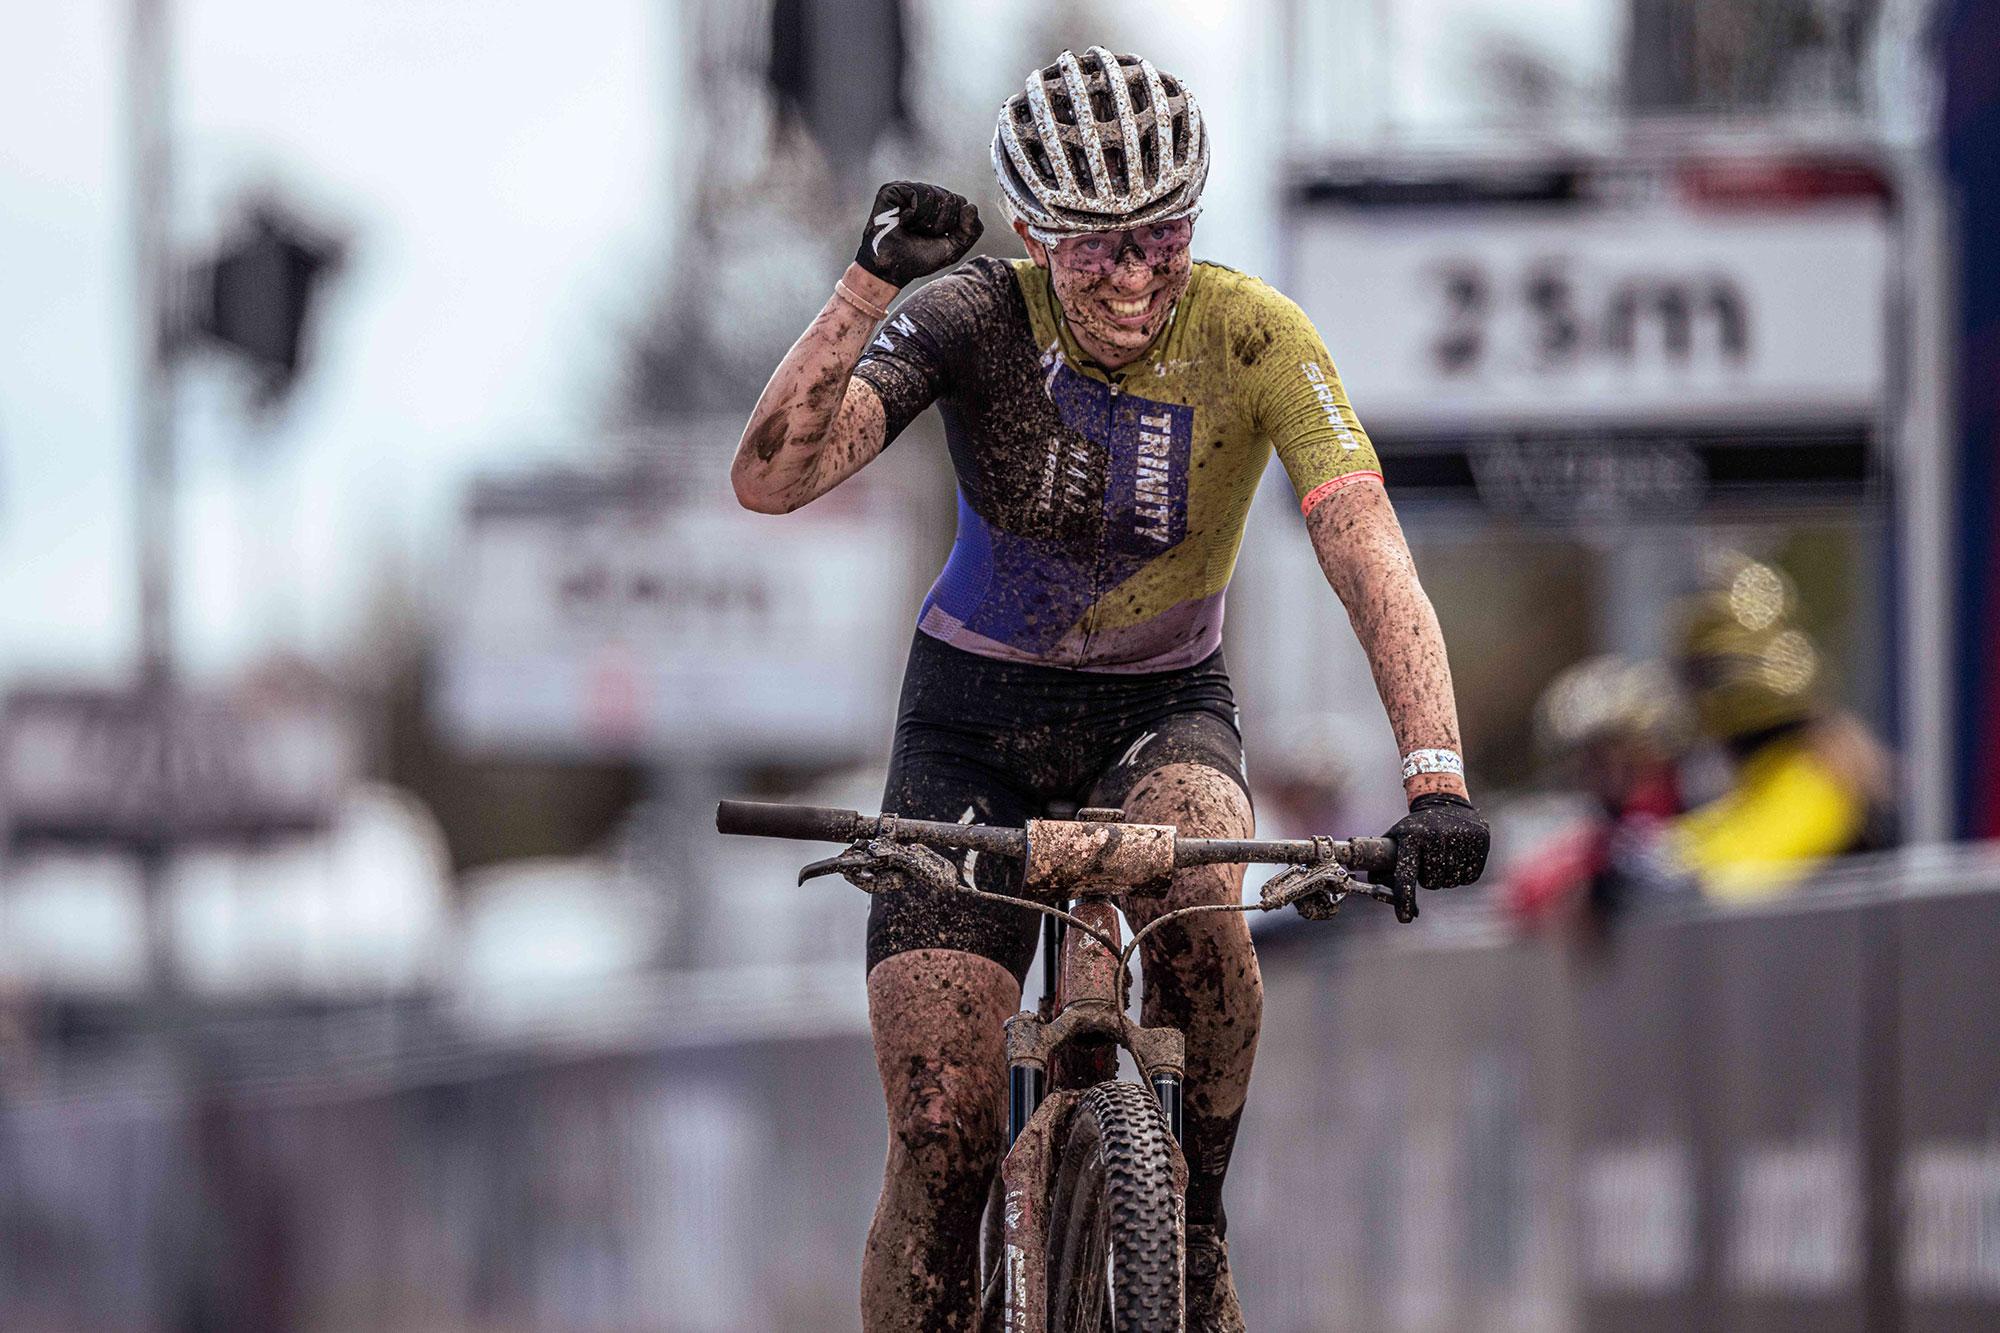 Female cyclist from Trinity Racing winning on mountain bike